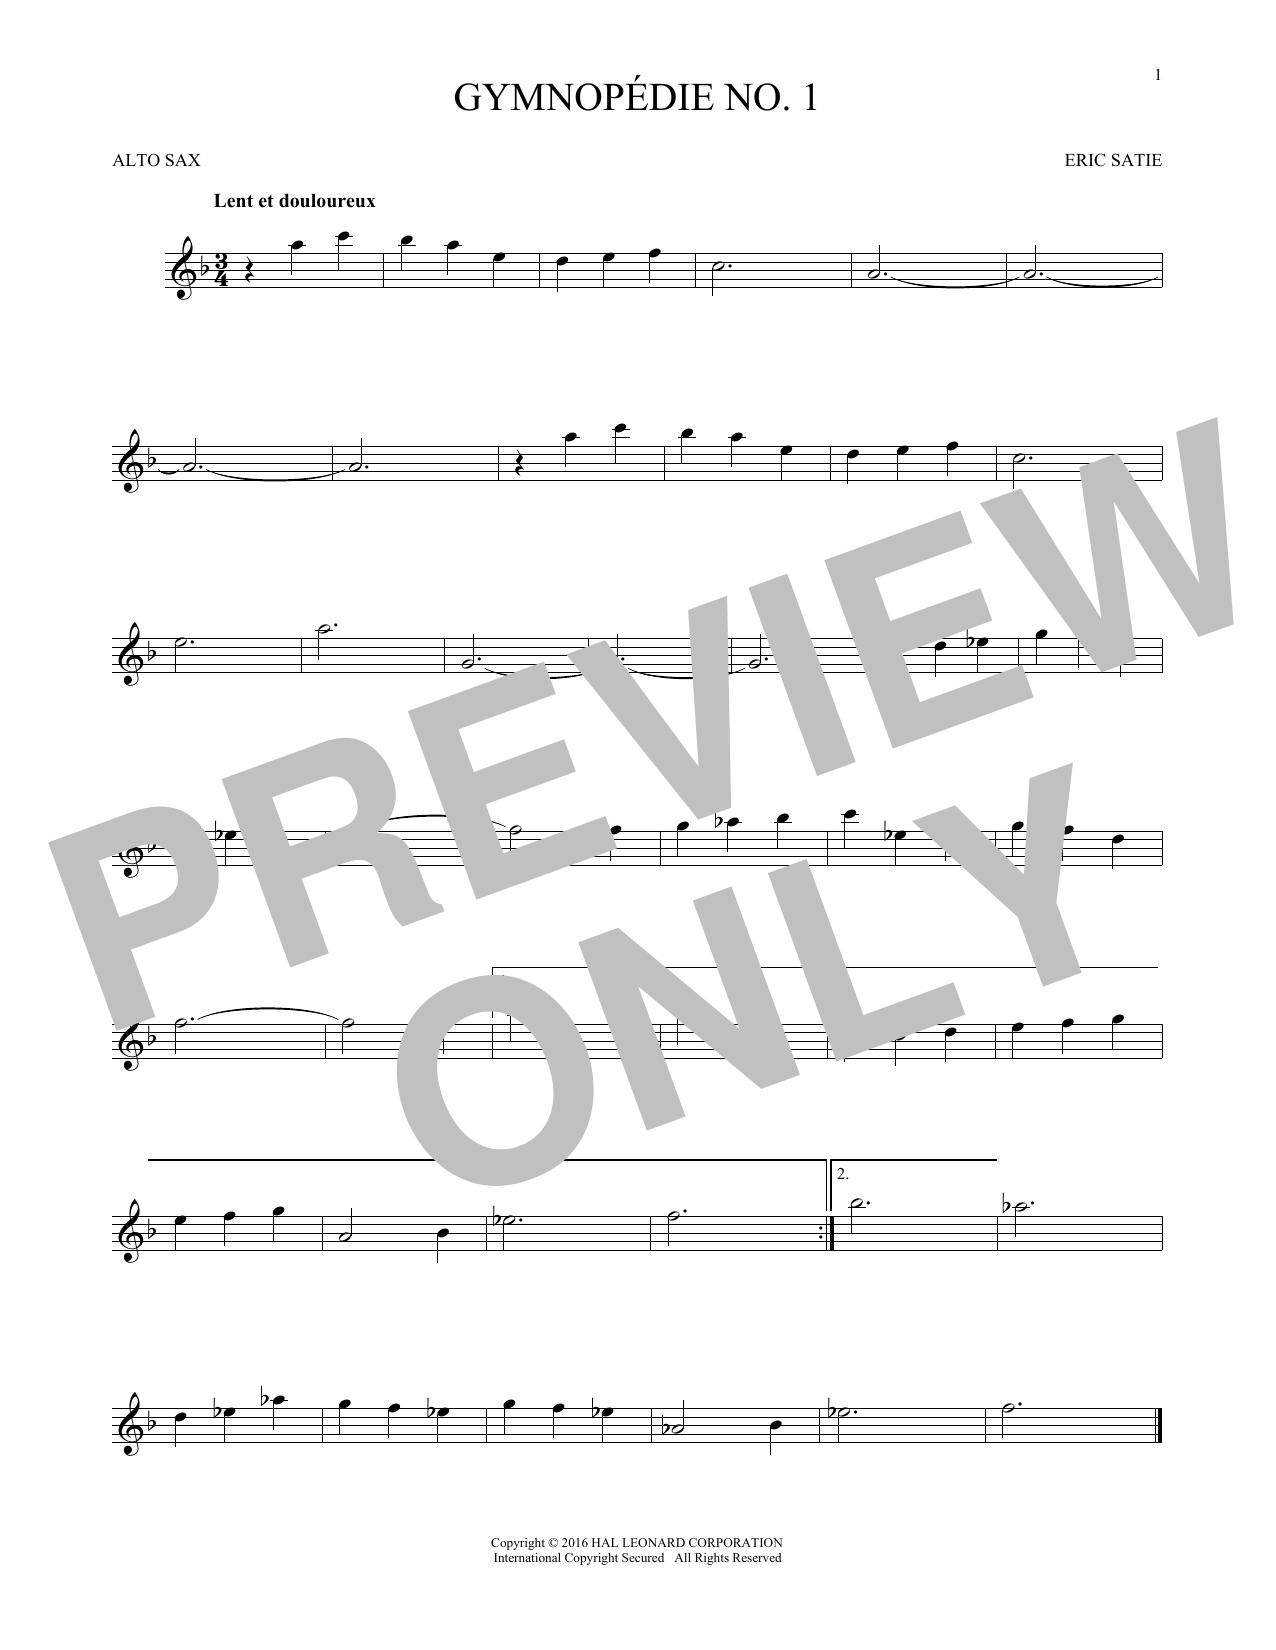 Gymnopedie No. 1 (Alto Sax Solo)